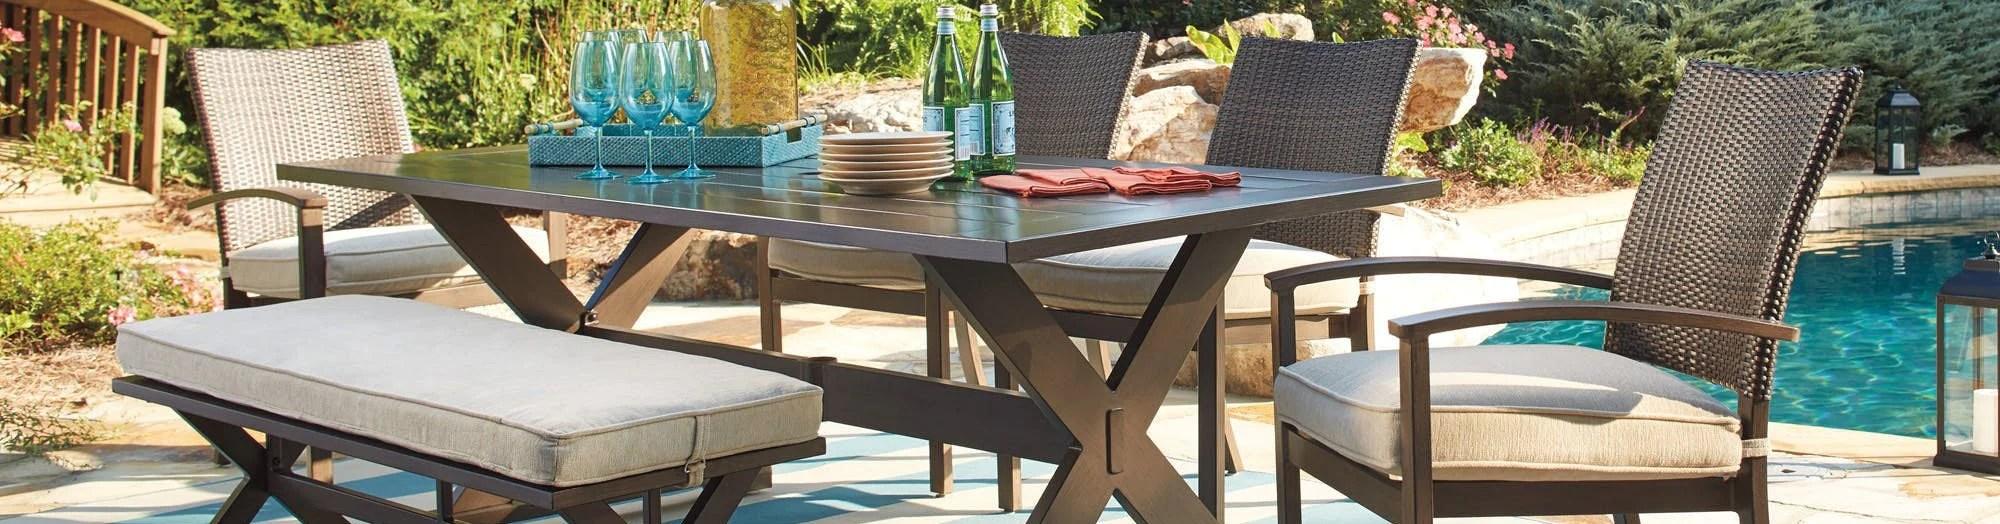 outdoor furniture furniture fair